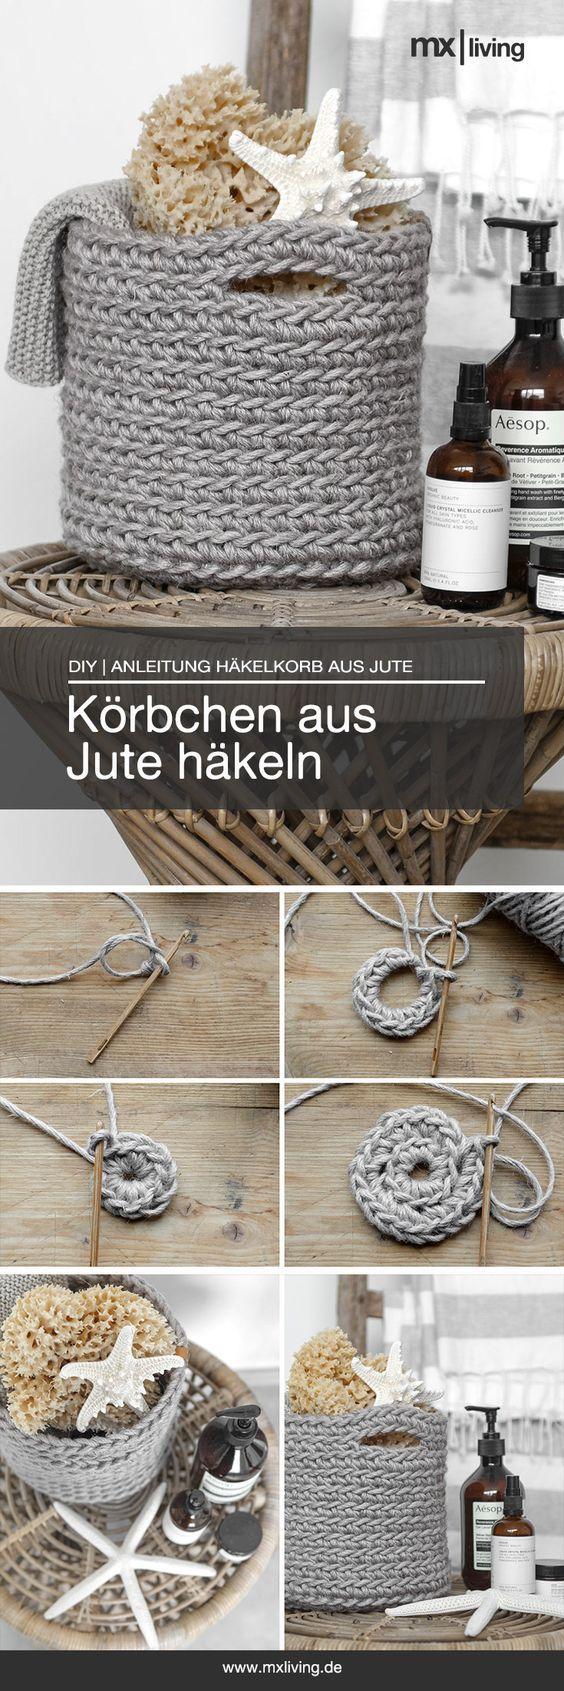 Photo of DIY | Häkeln Sie Jutekorb mit Griff – mxliving